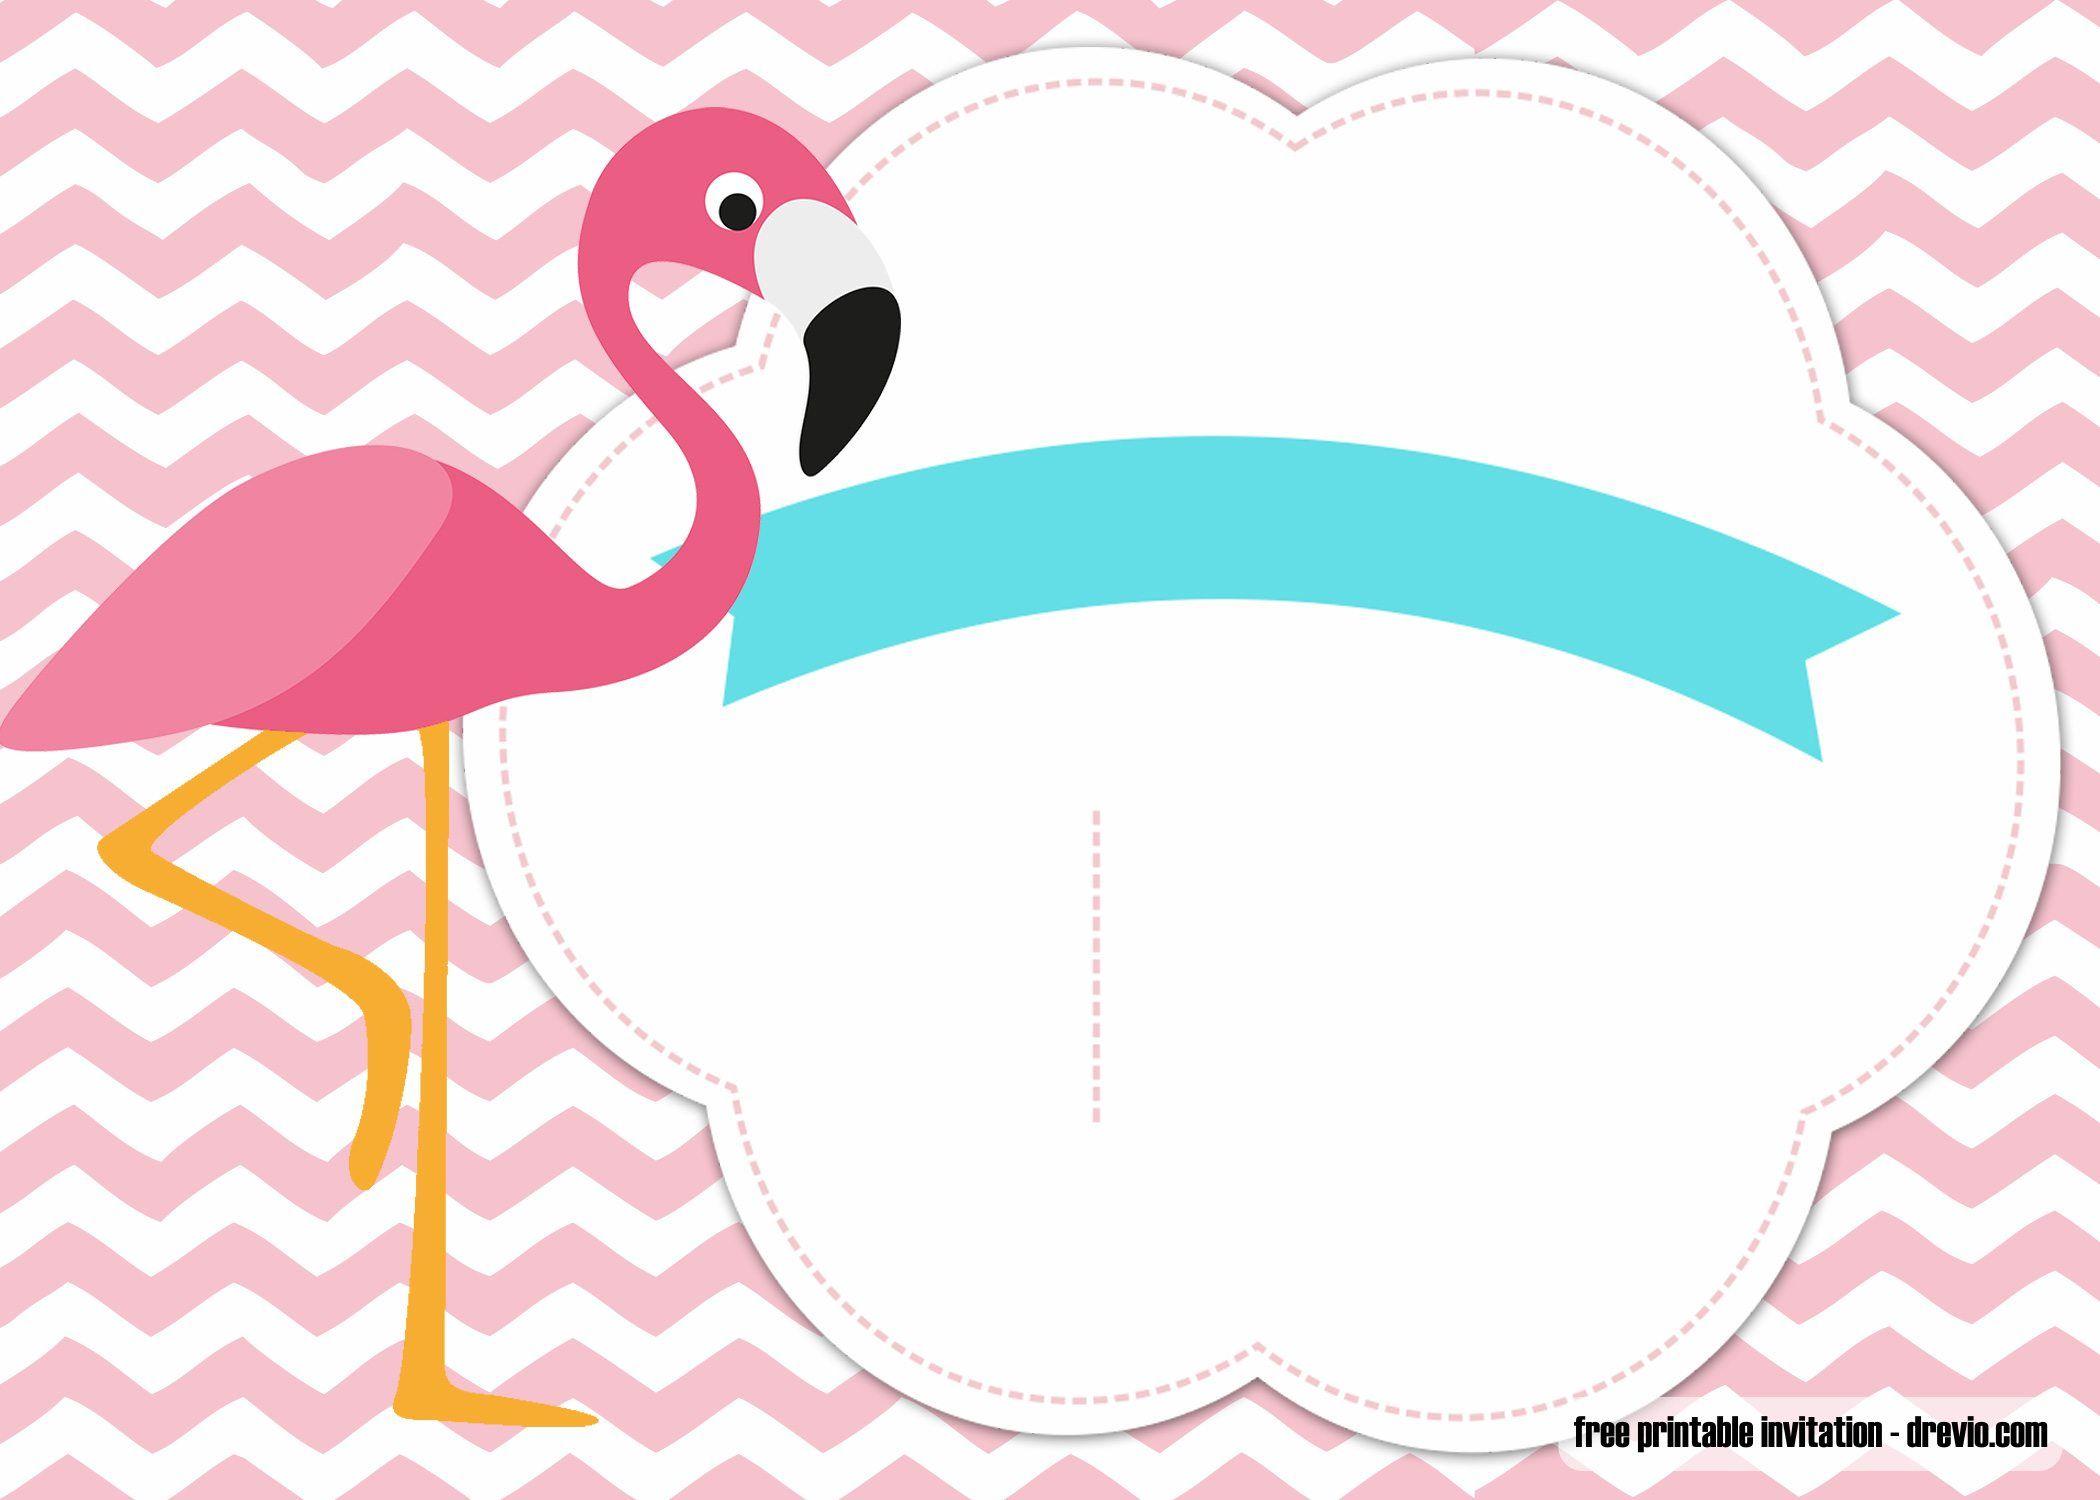 Free Flamingo Pool Party Invitation Template Party Invite Template Pool Party Invitation Template Pool Party Invitations